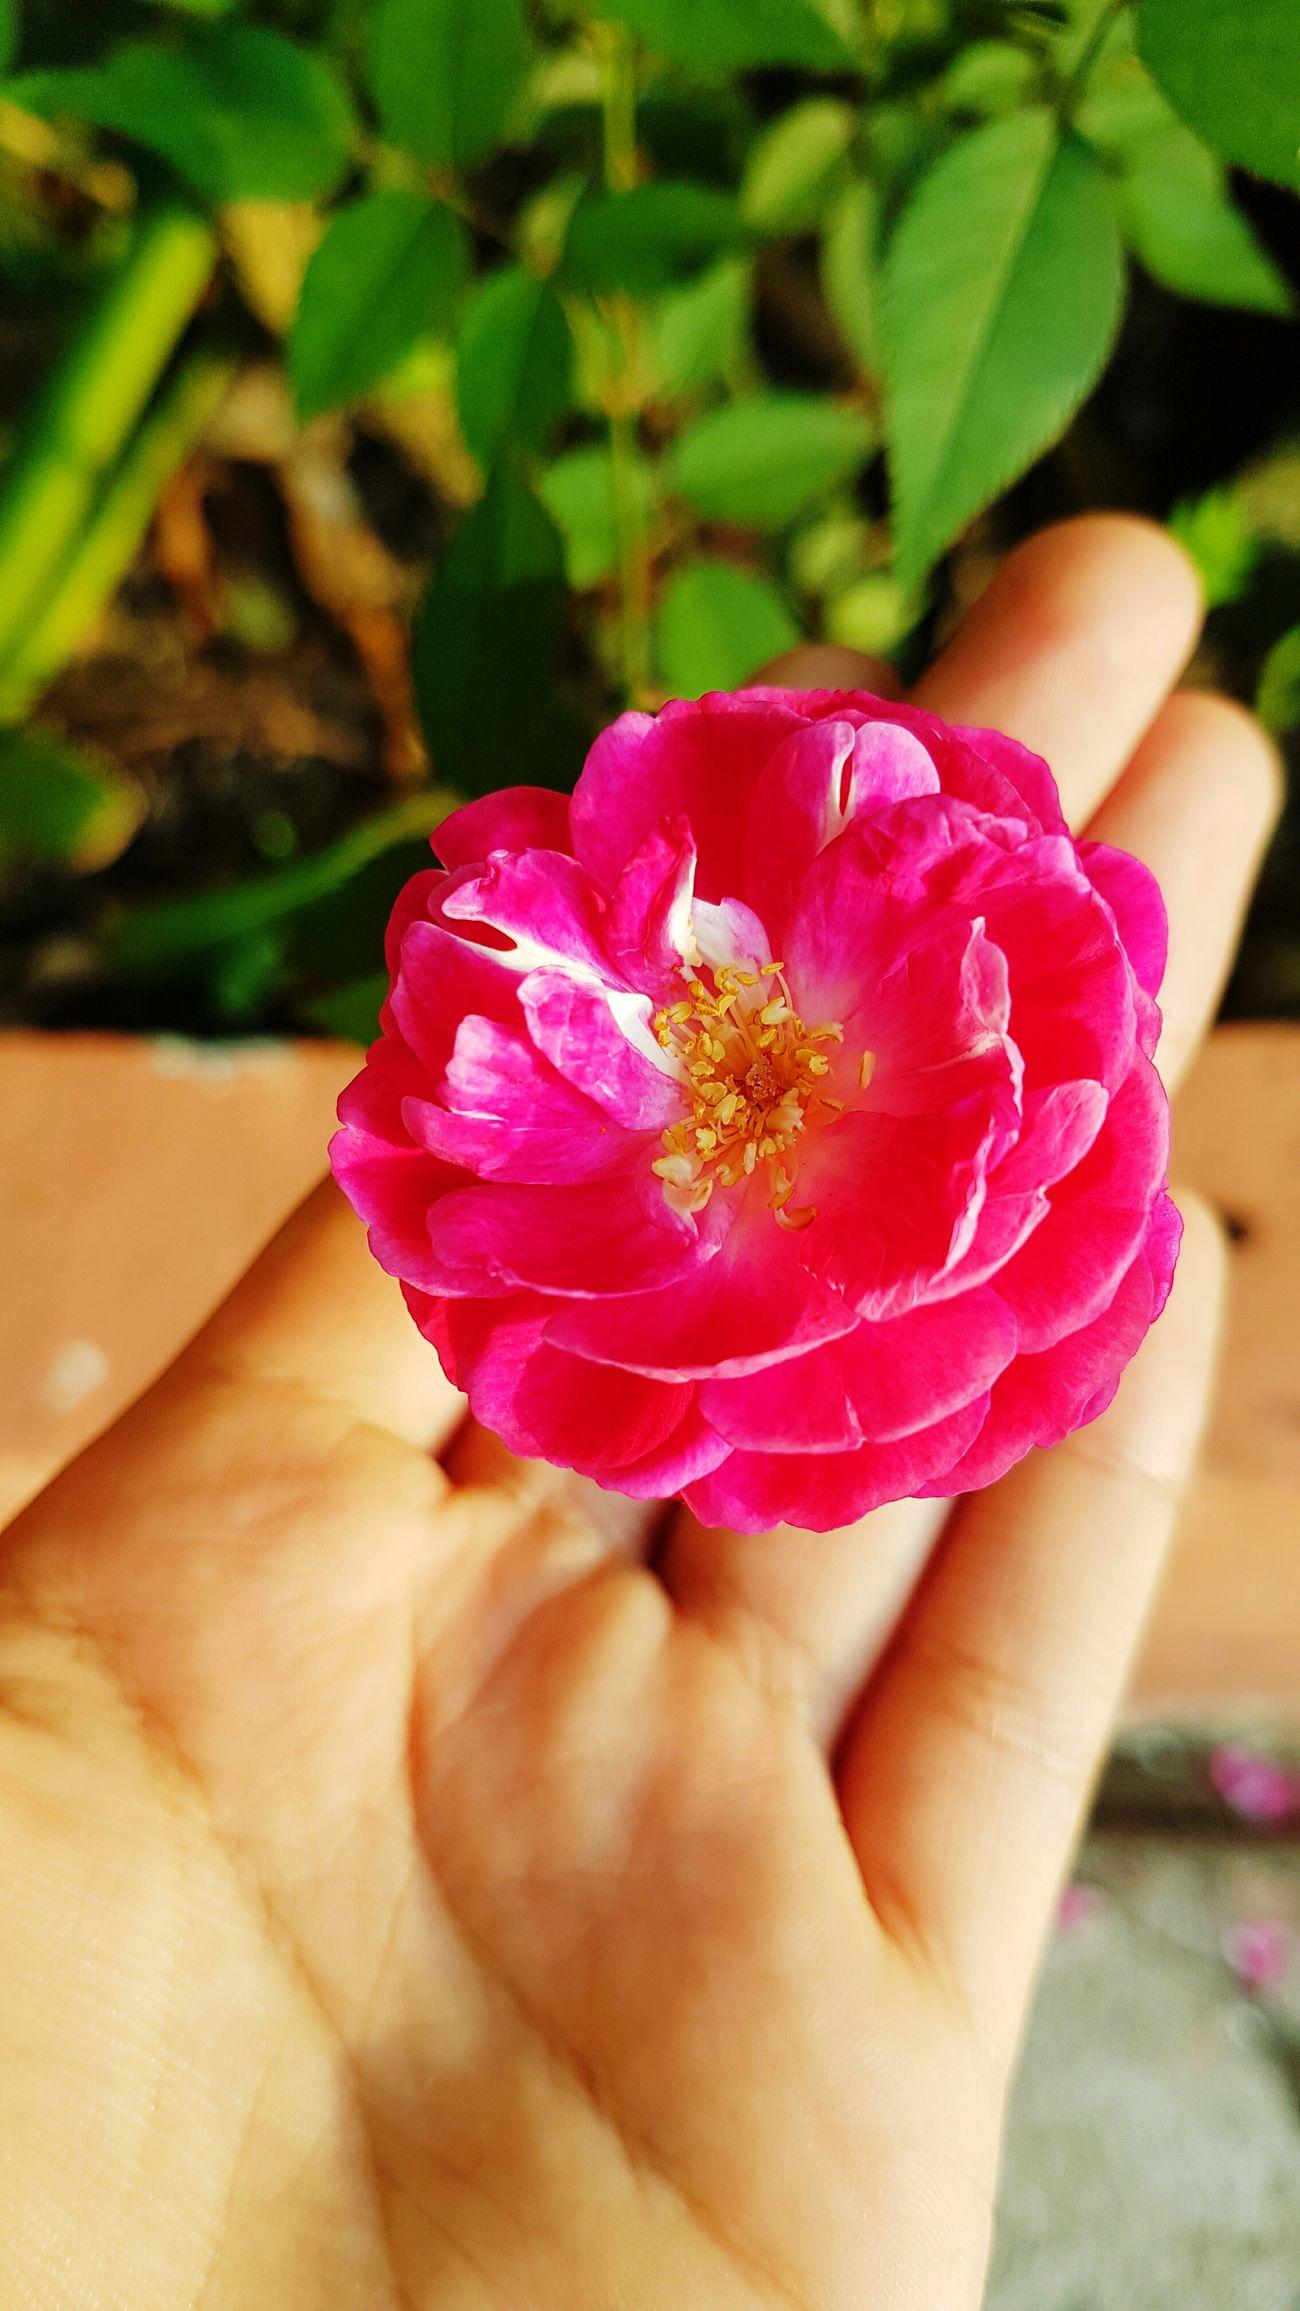 lo tenemos en nuestras manos Nature_collection Flor Nature Flower Flora Floralperfection Lindo  Nature Naturaleza🌵🌻🎶 Naturaleza🌾🌿 Naturaleza Rosas🌹🌹 Rosas Rosa Rosas Bonitas❤️🌹 Rosado Rosas Rojas Day Flower Head